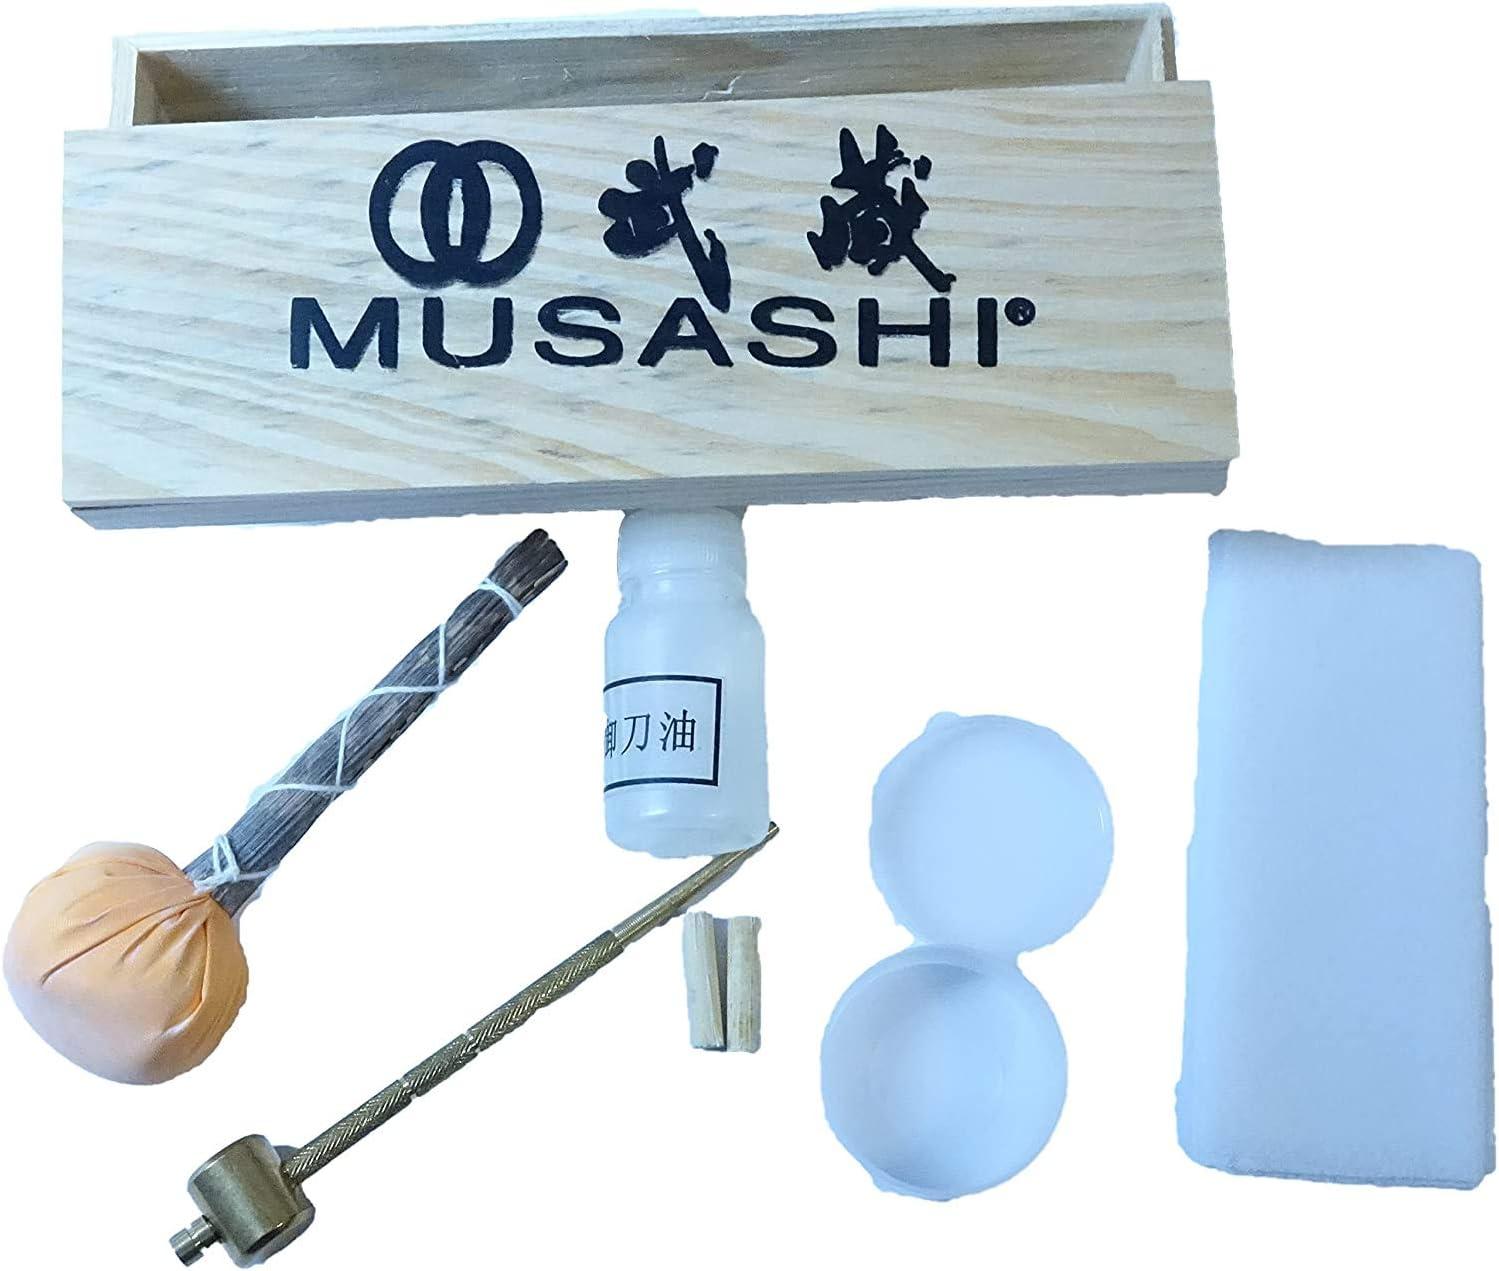 Musashi Japanese A Japan Maker New surprise price is realized Samurai Katana Care Sword Maintenance Cleaning